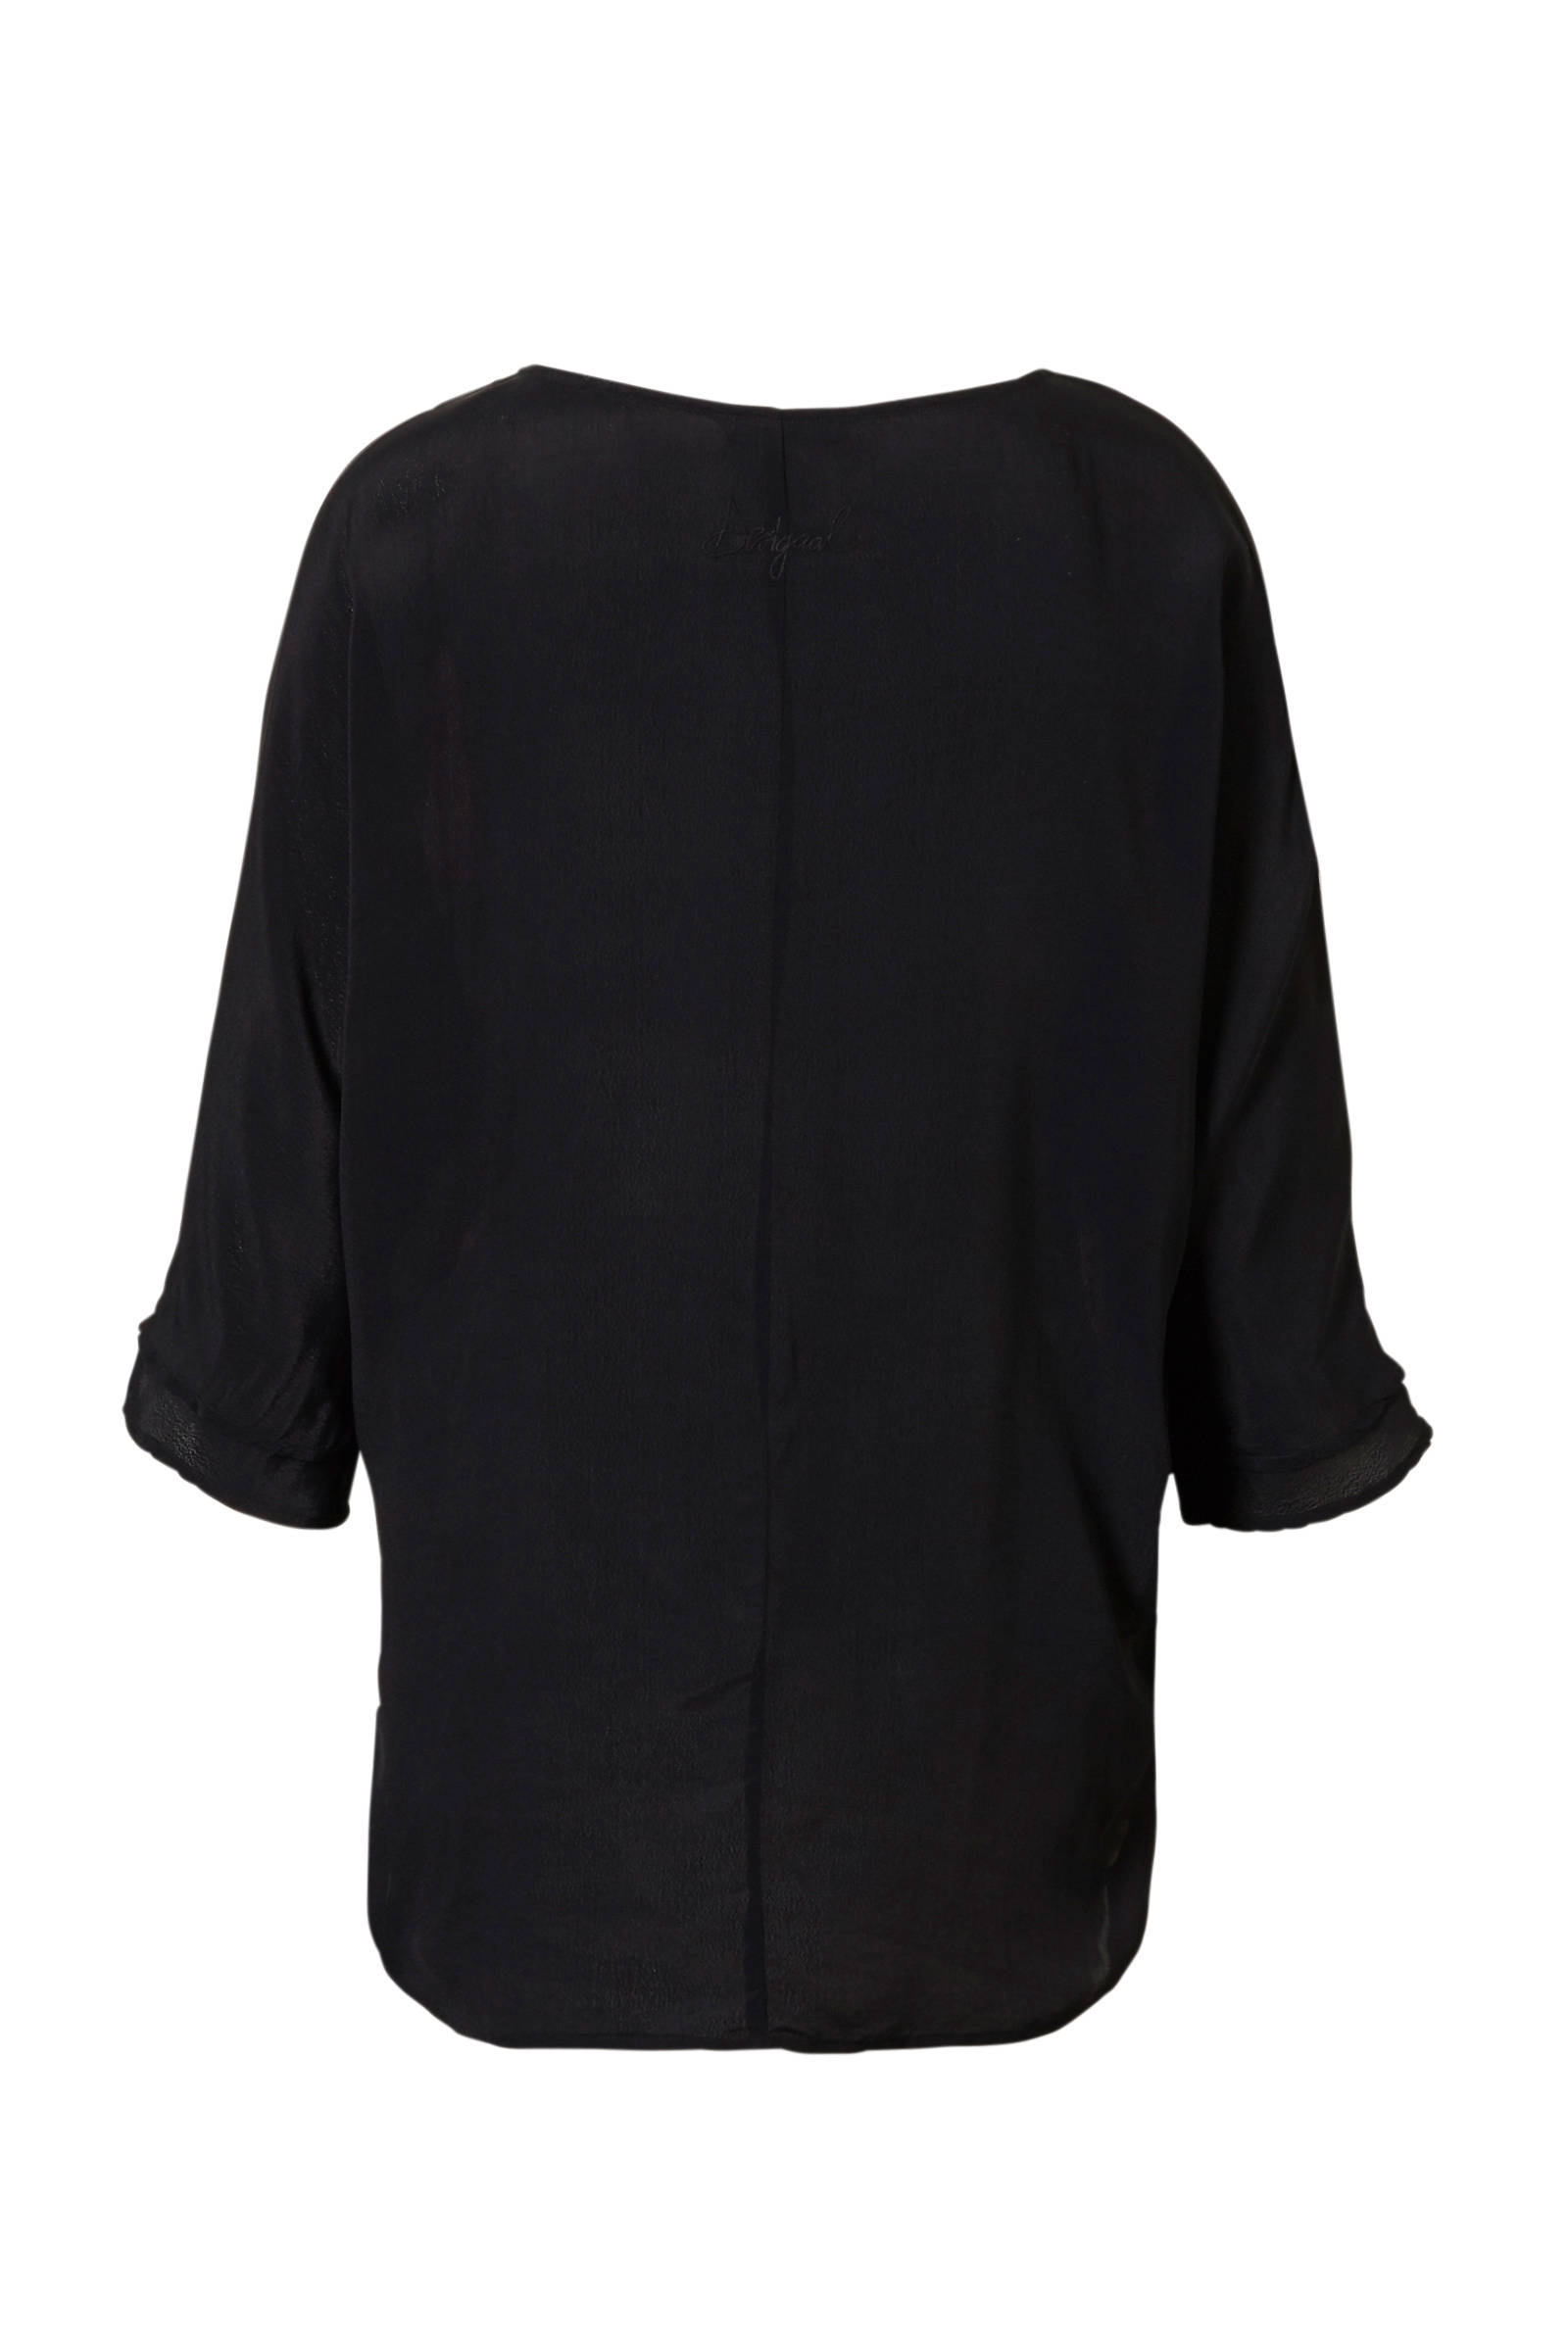 Desigual bloemenprint met blouse Desigual blouse tgrqIRr